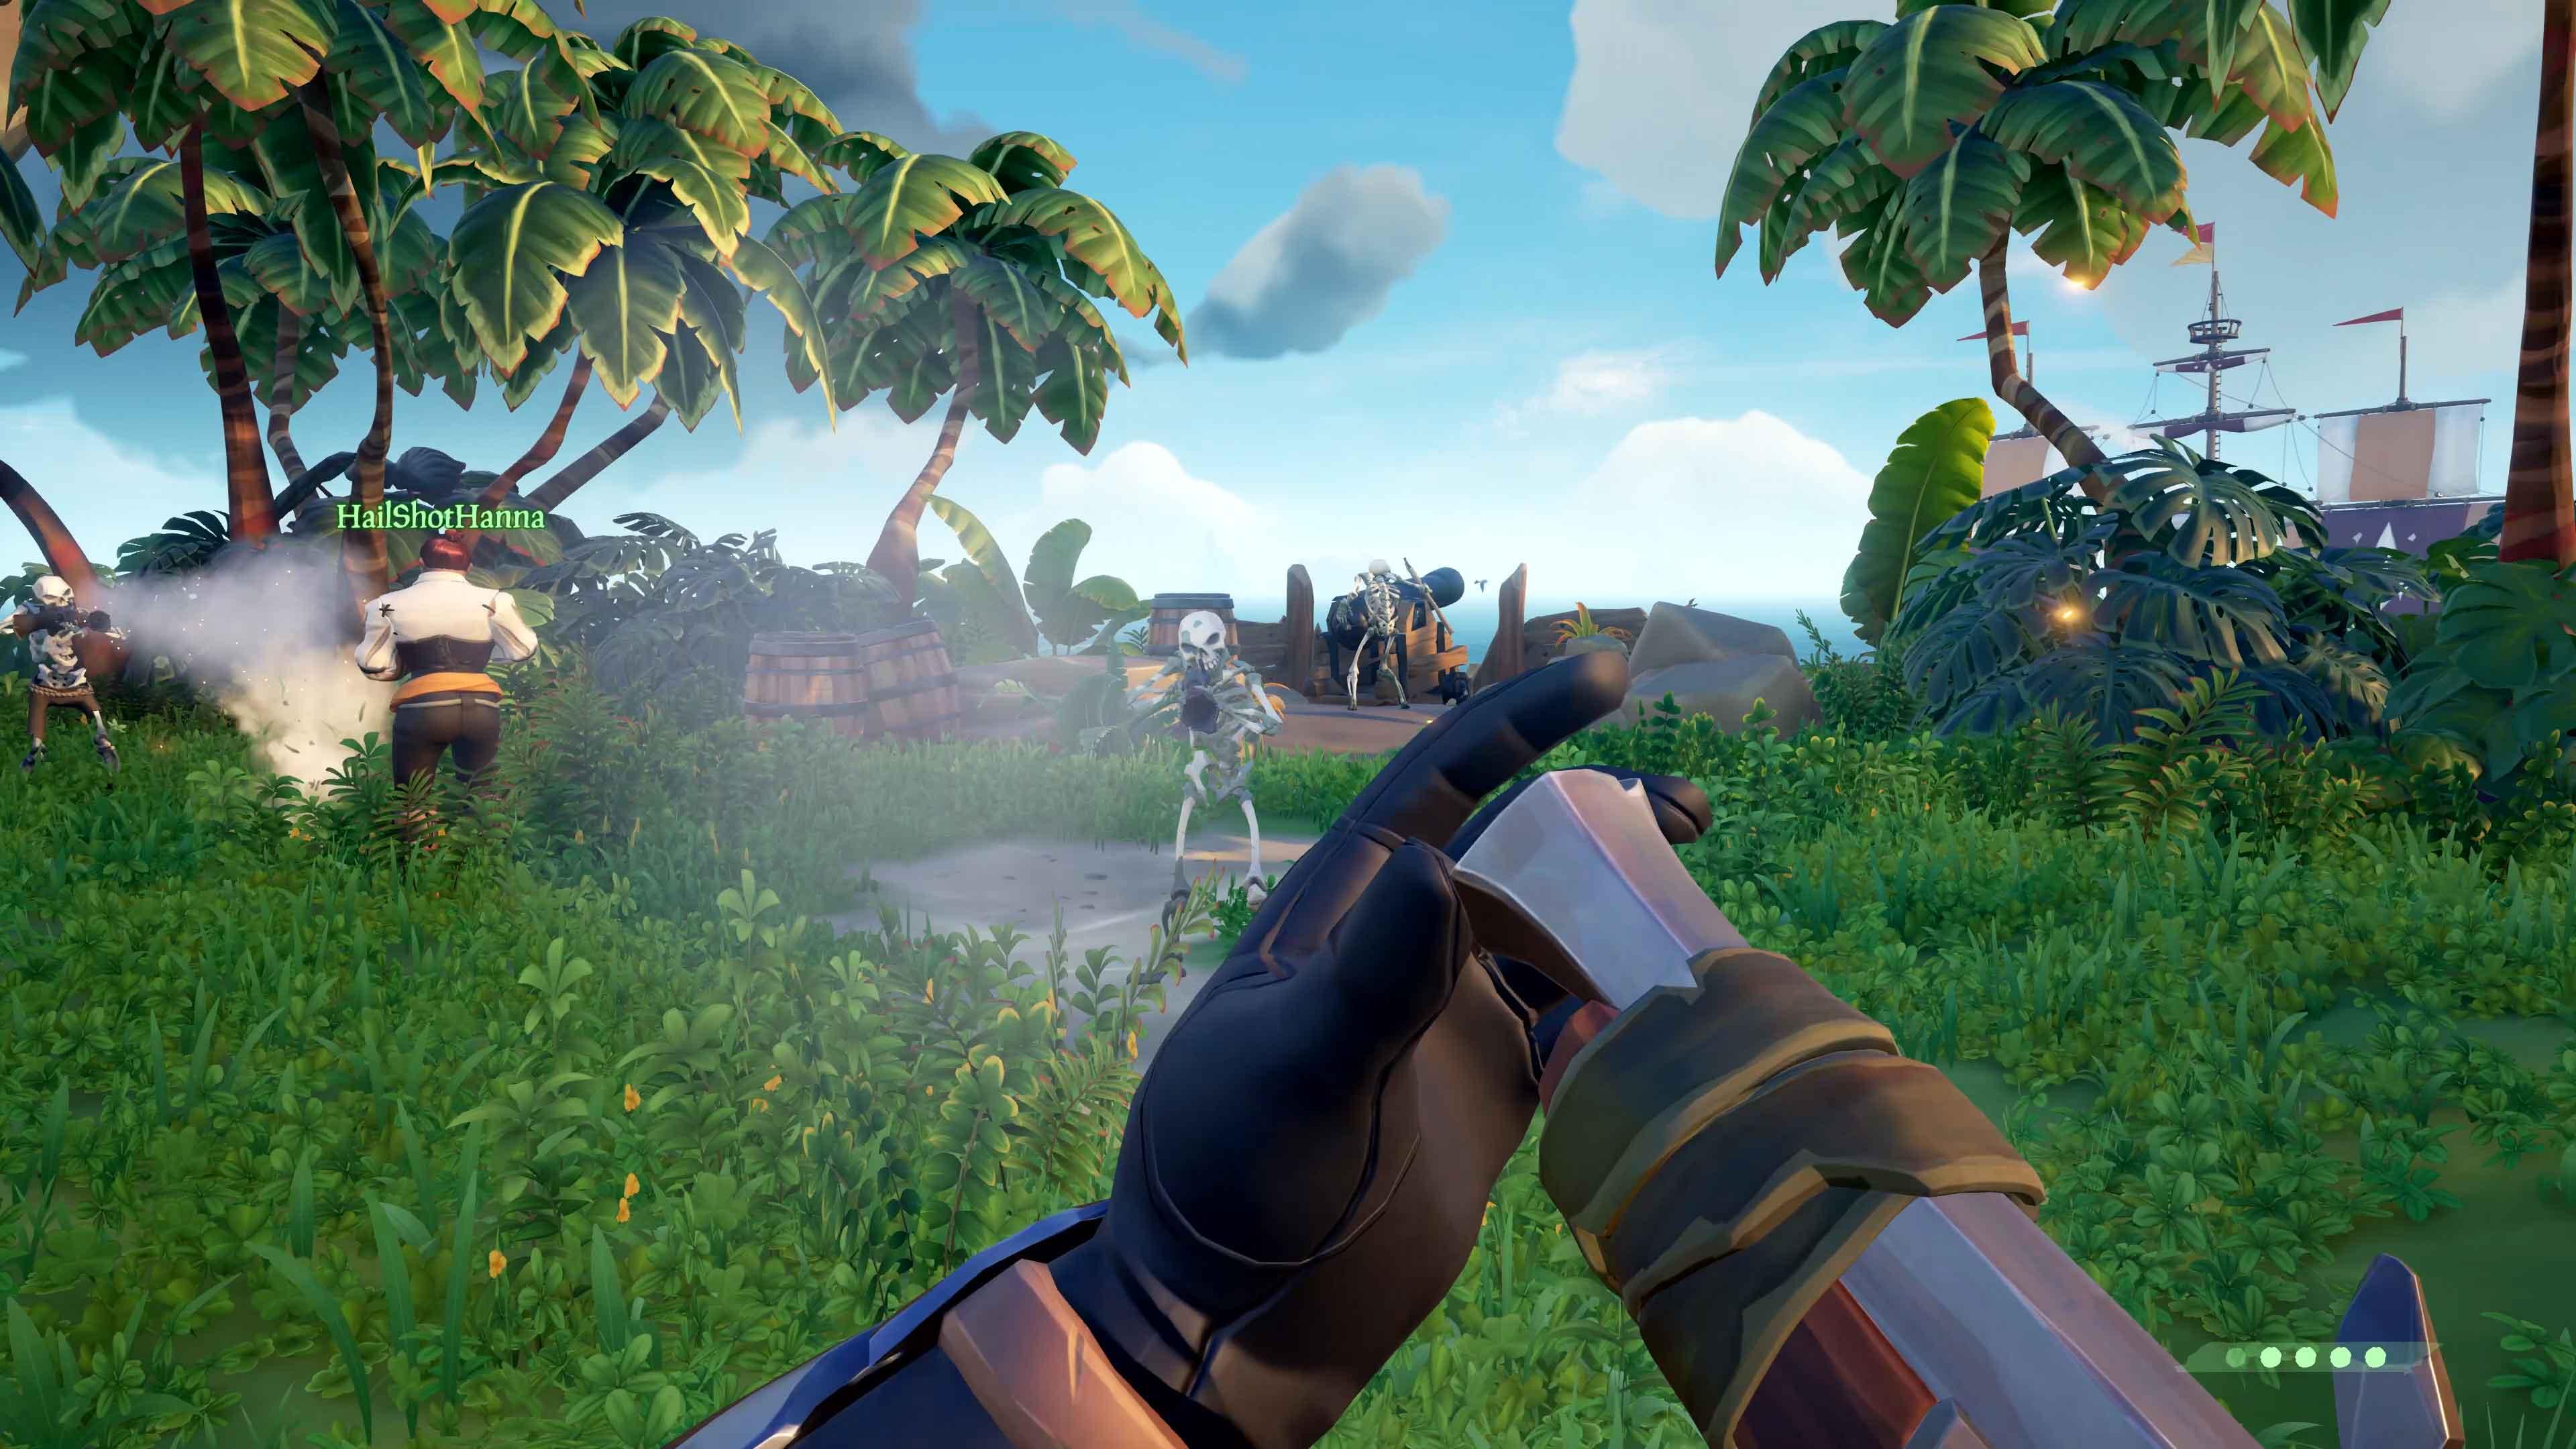 Sea of thieves island screenshot